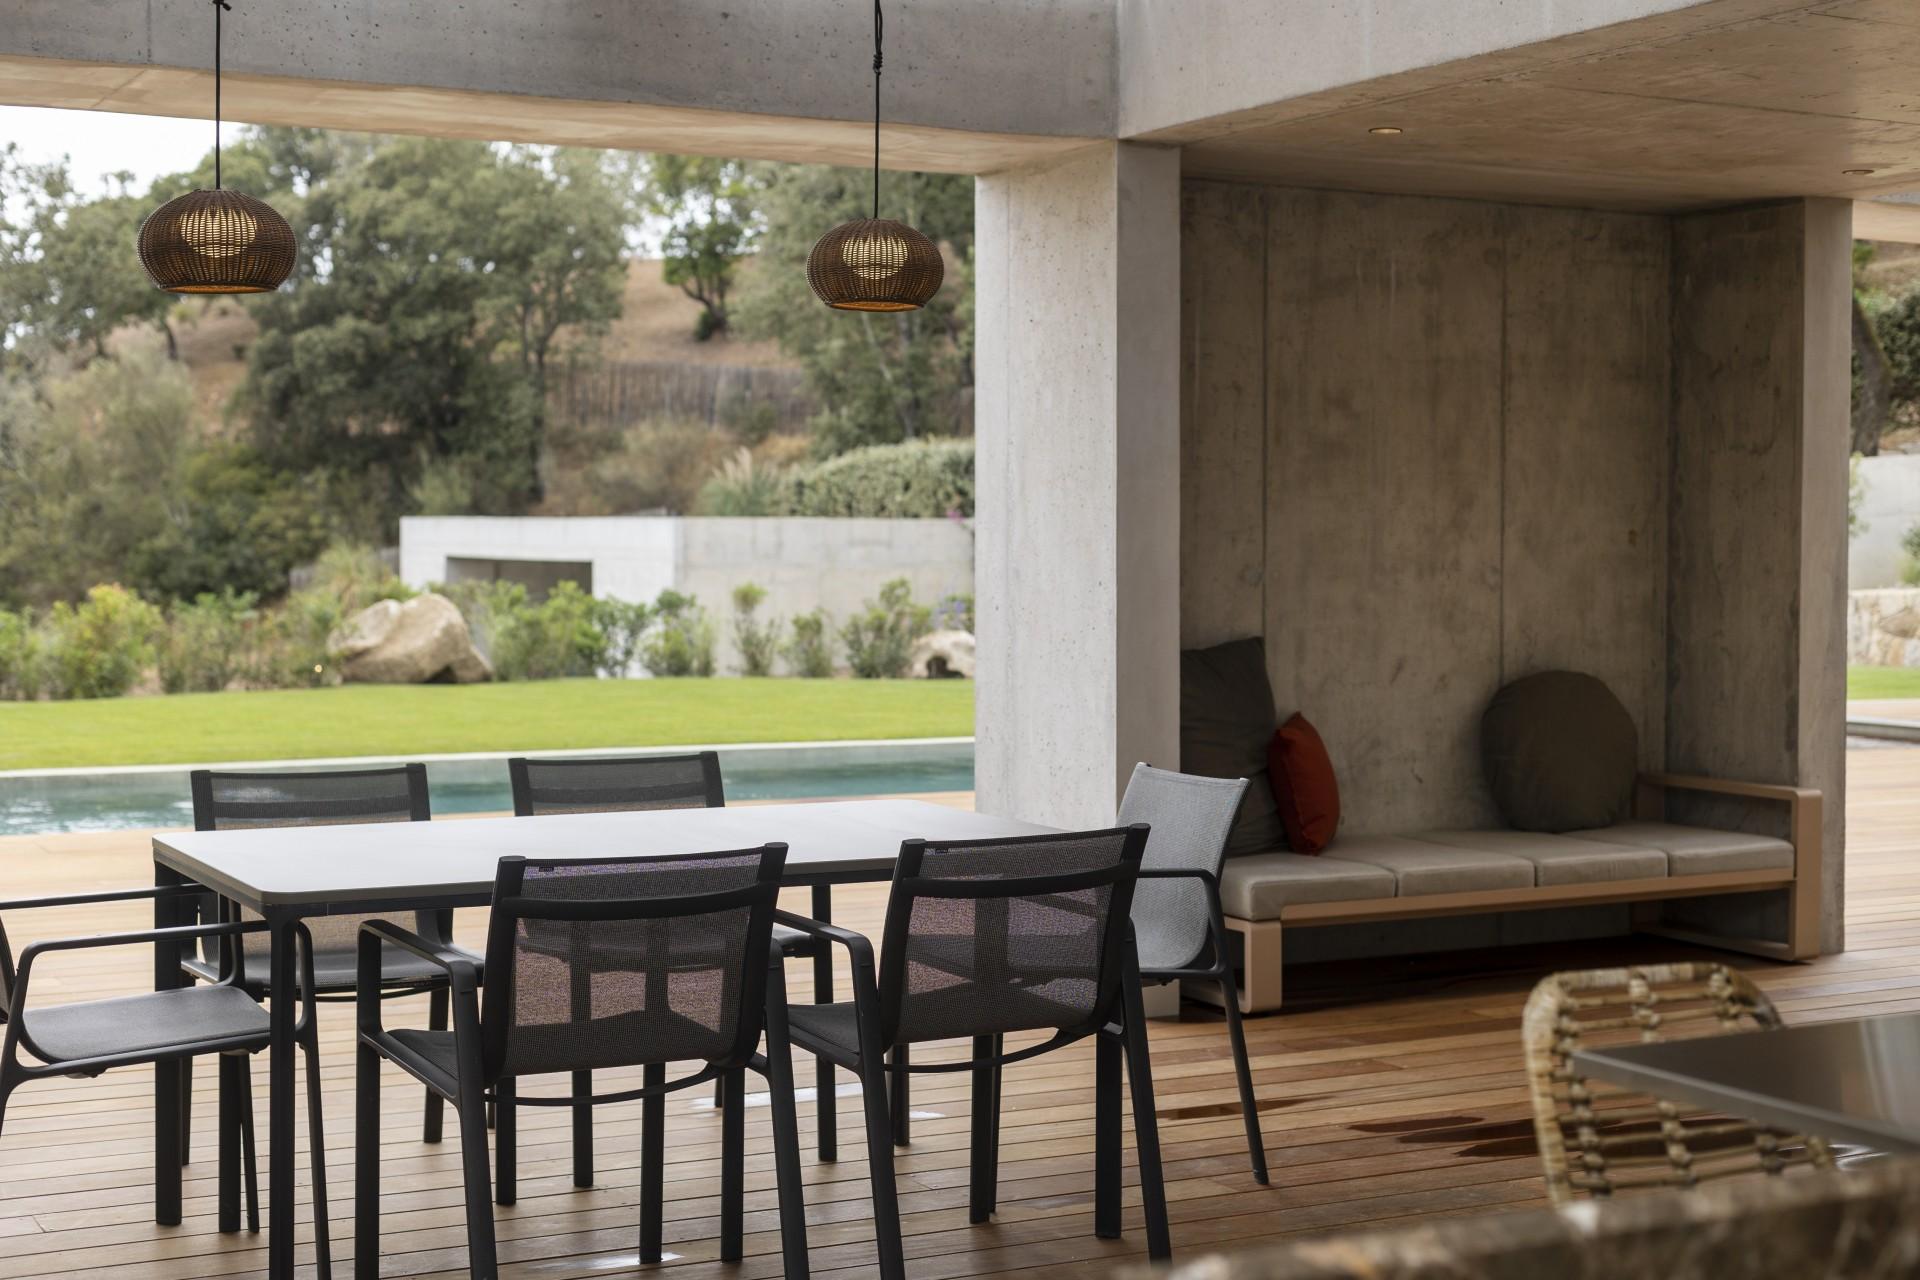 Propriano Luxury Rental Villa Pyrale Terrace 3